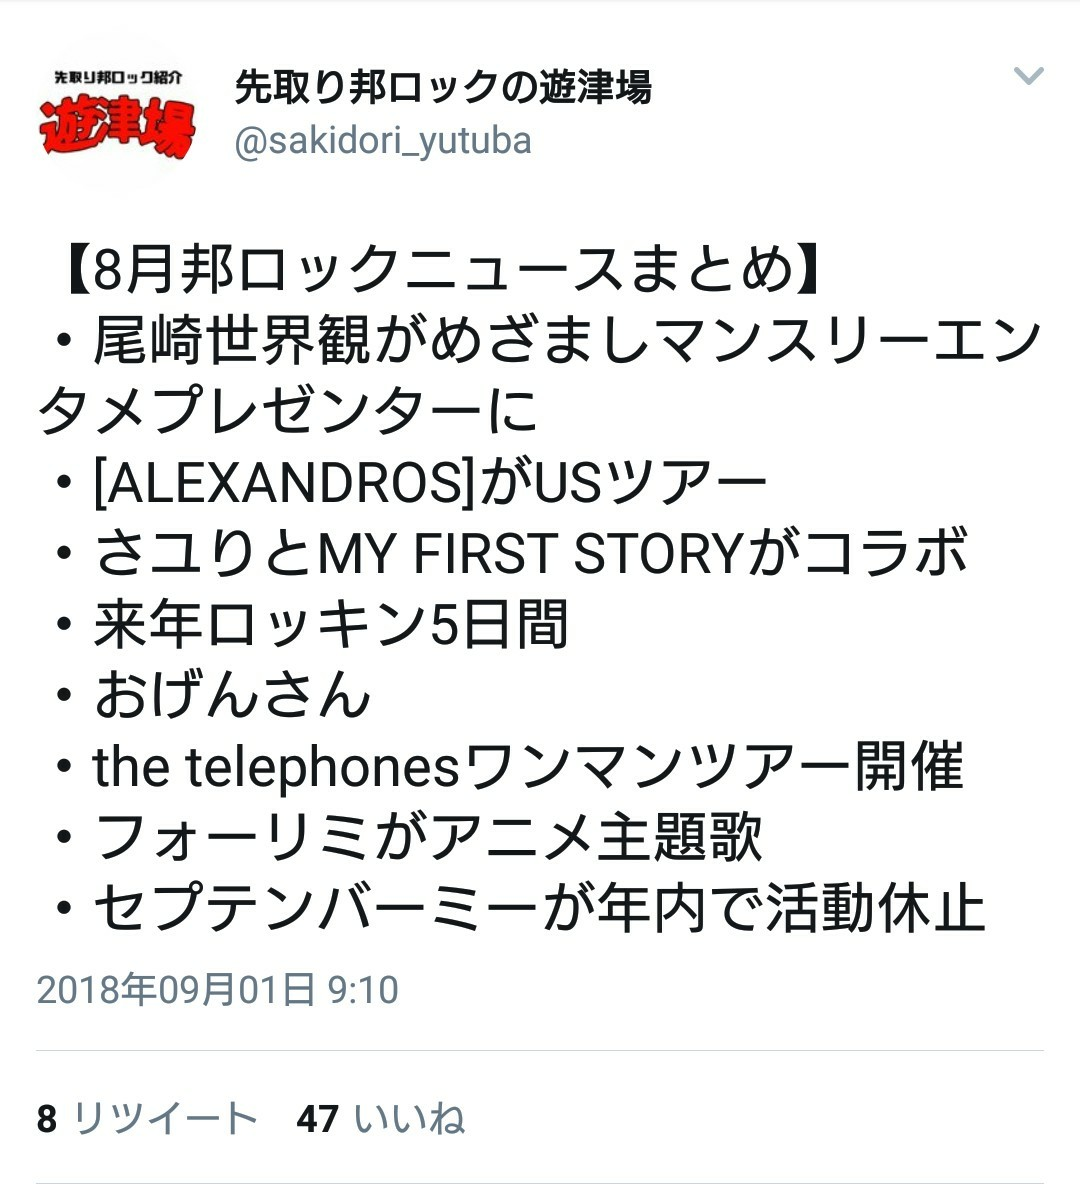 f:id:sakidoriyutsubarock:20181213223829j:plain